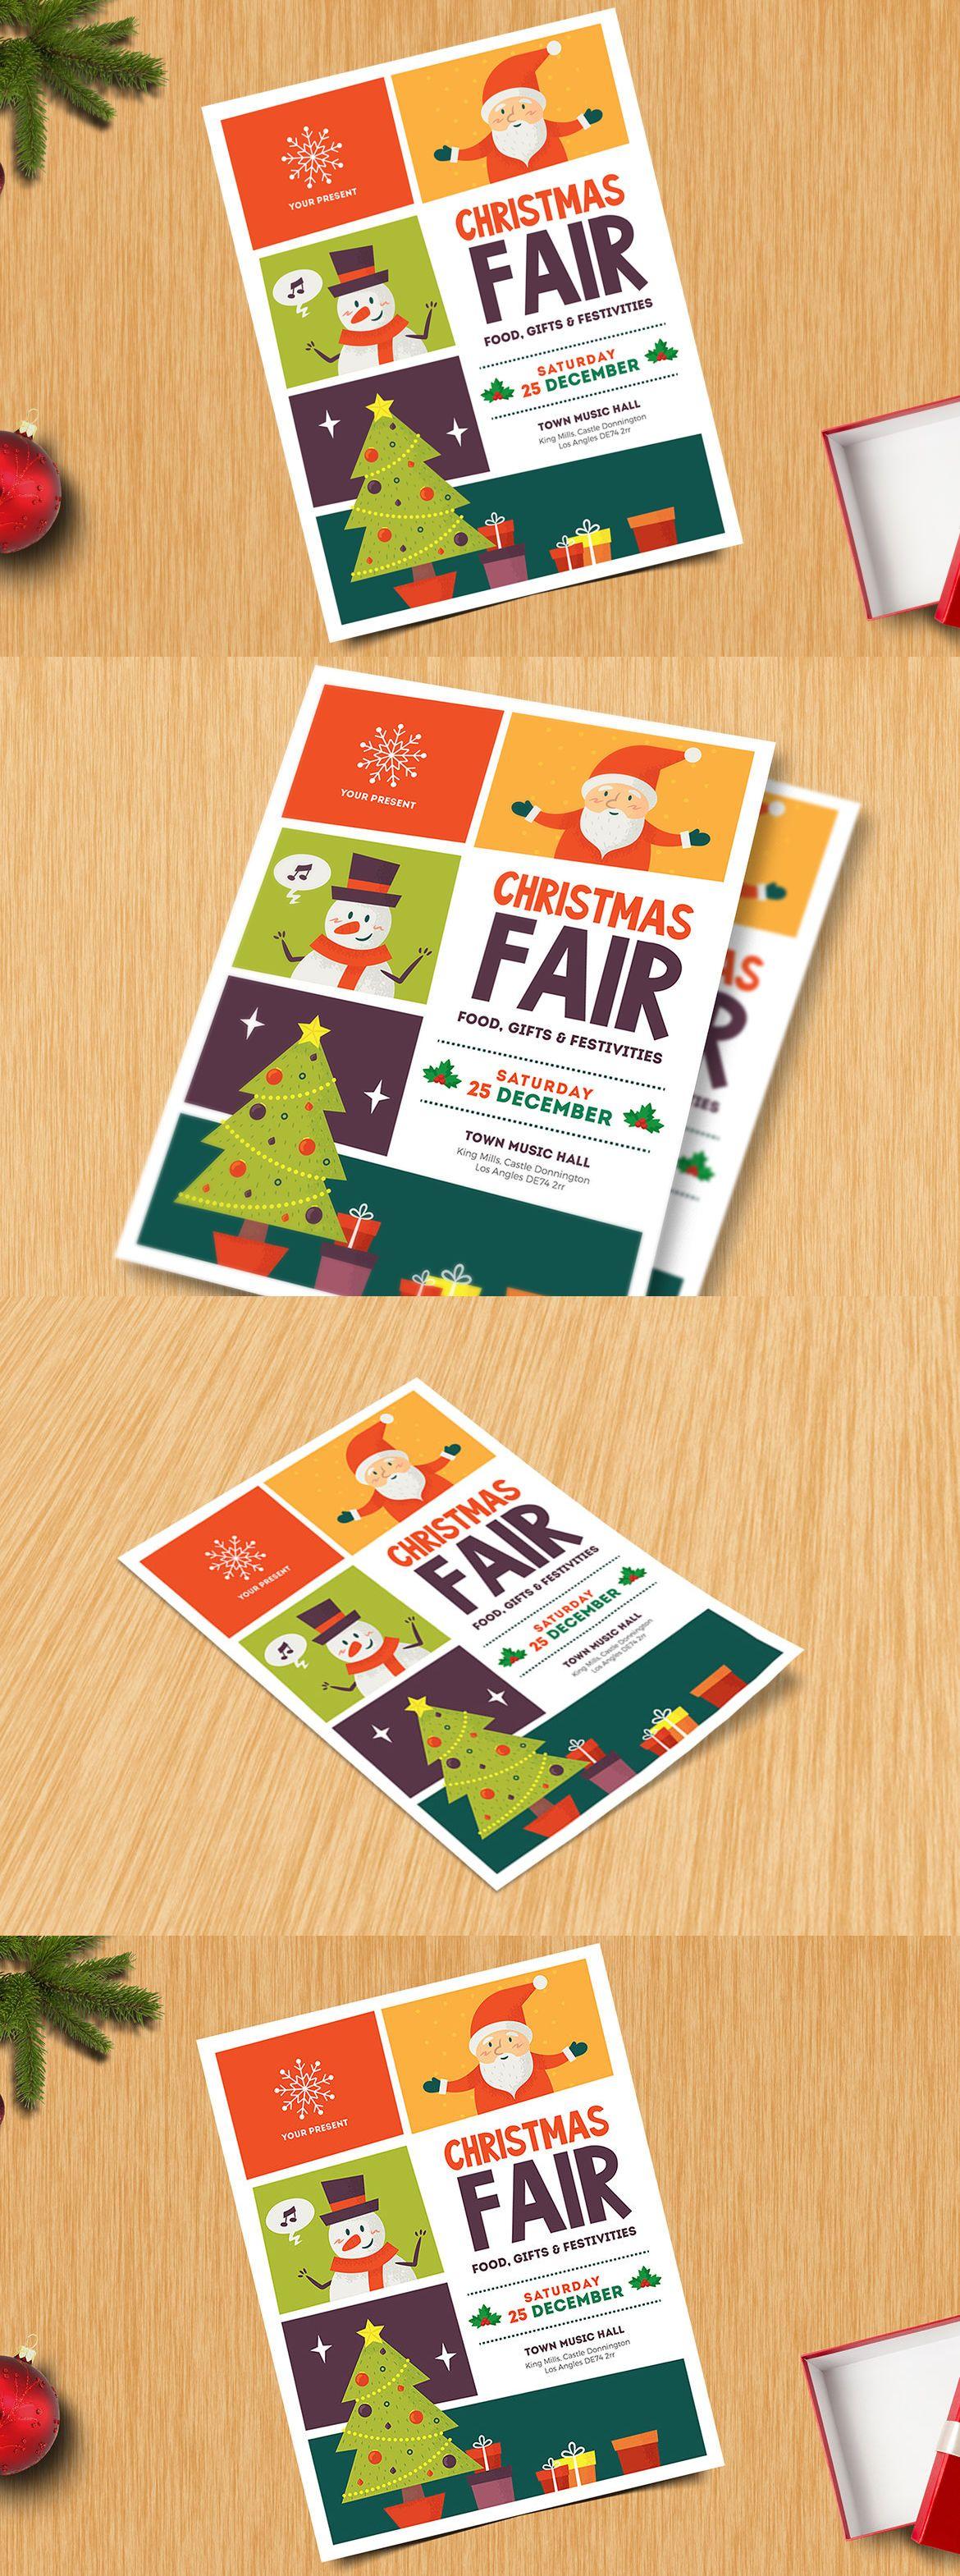 christmas fair flyer template vector ai psd flyer design